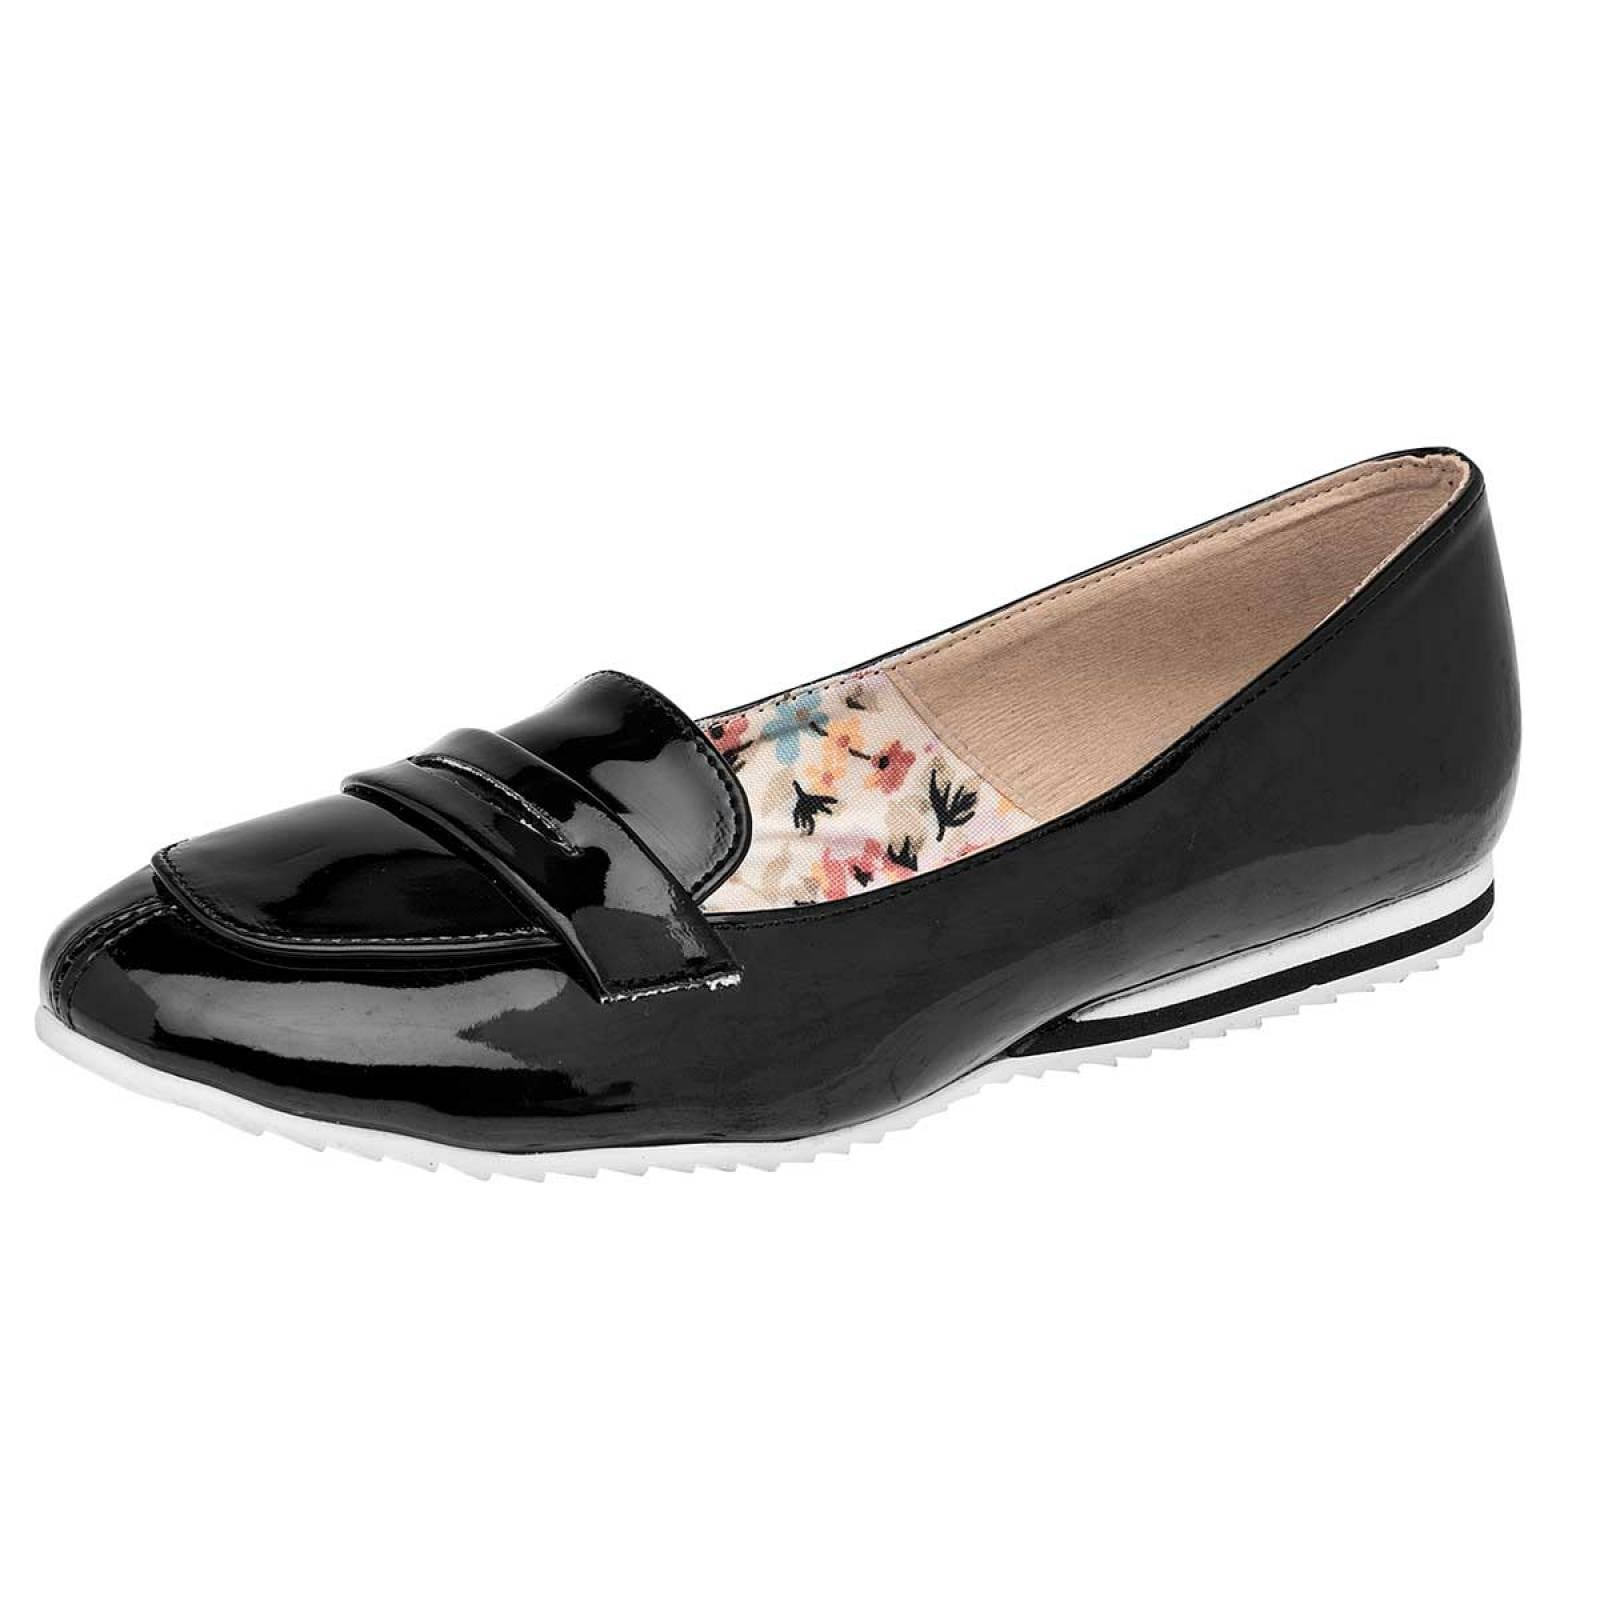 Gilardi Zapato Mujer Negro charol